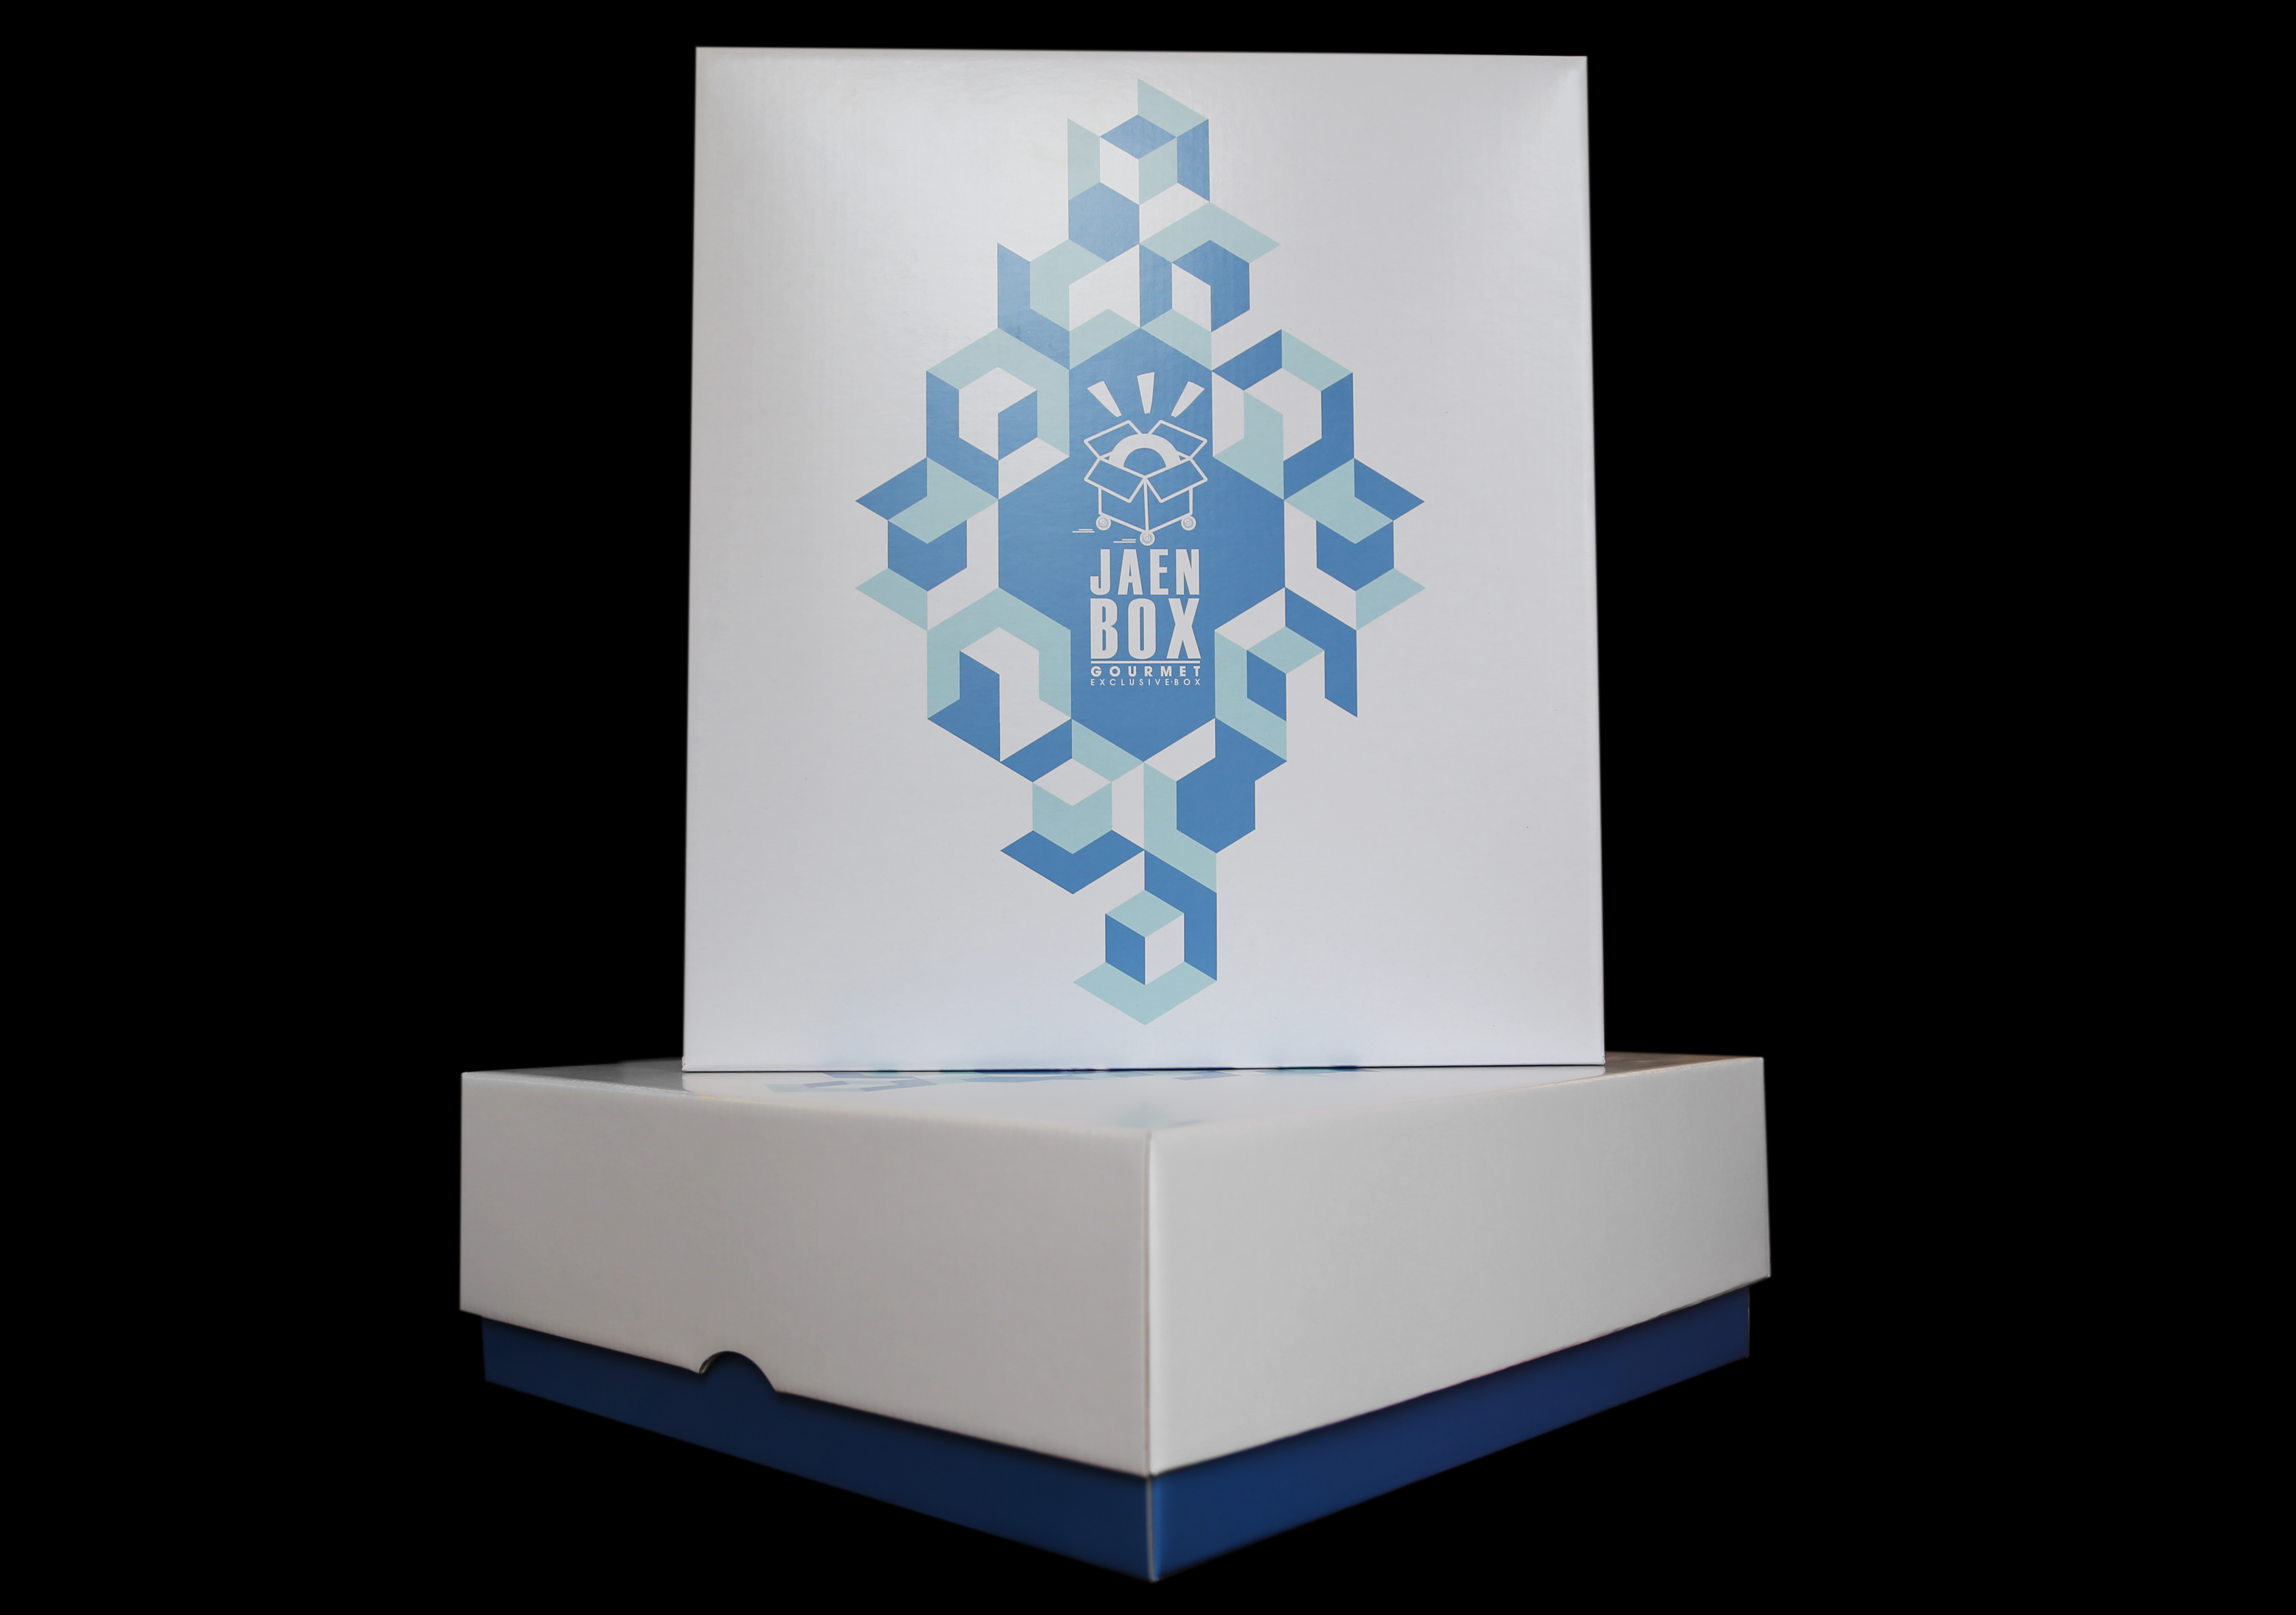 Caja Cata JaénBox